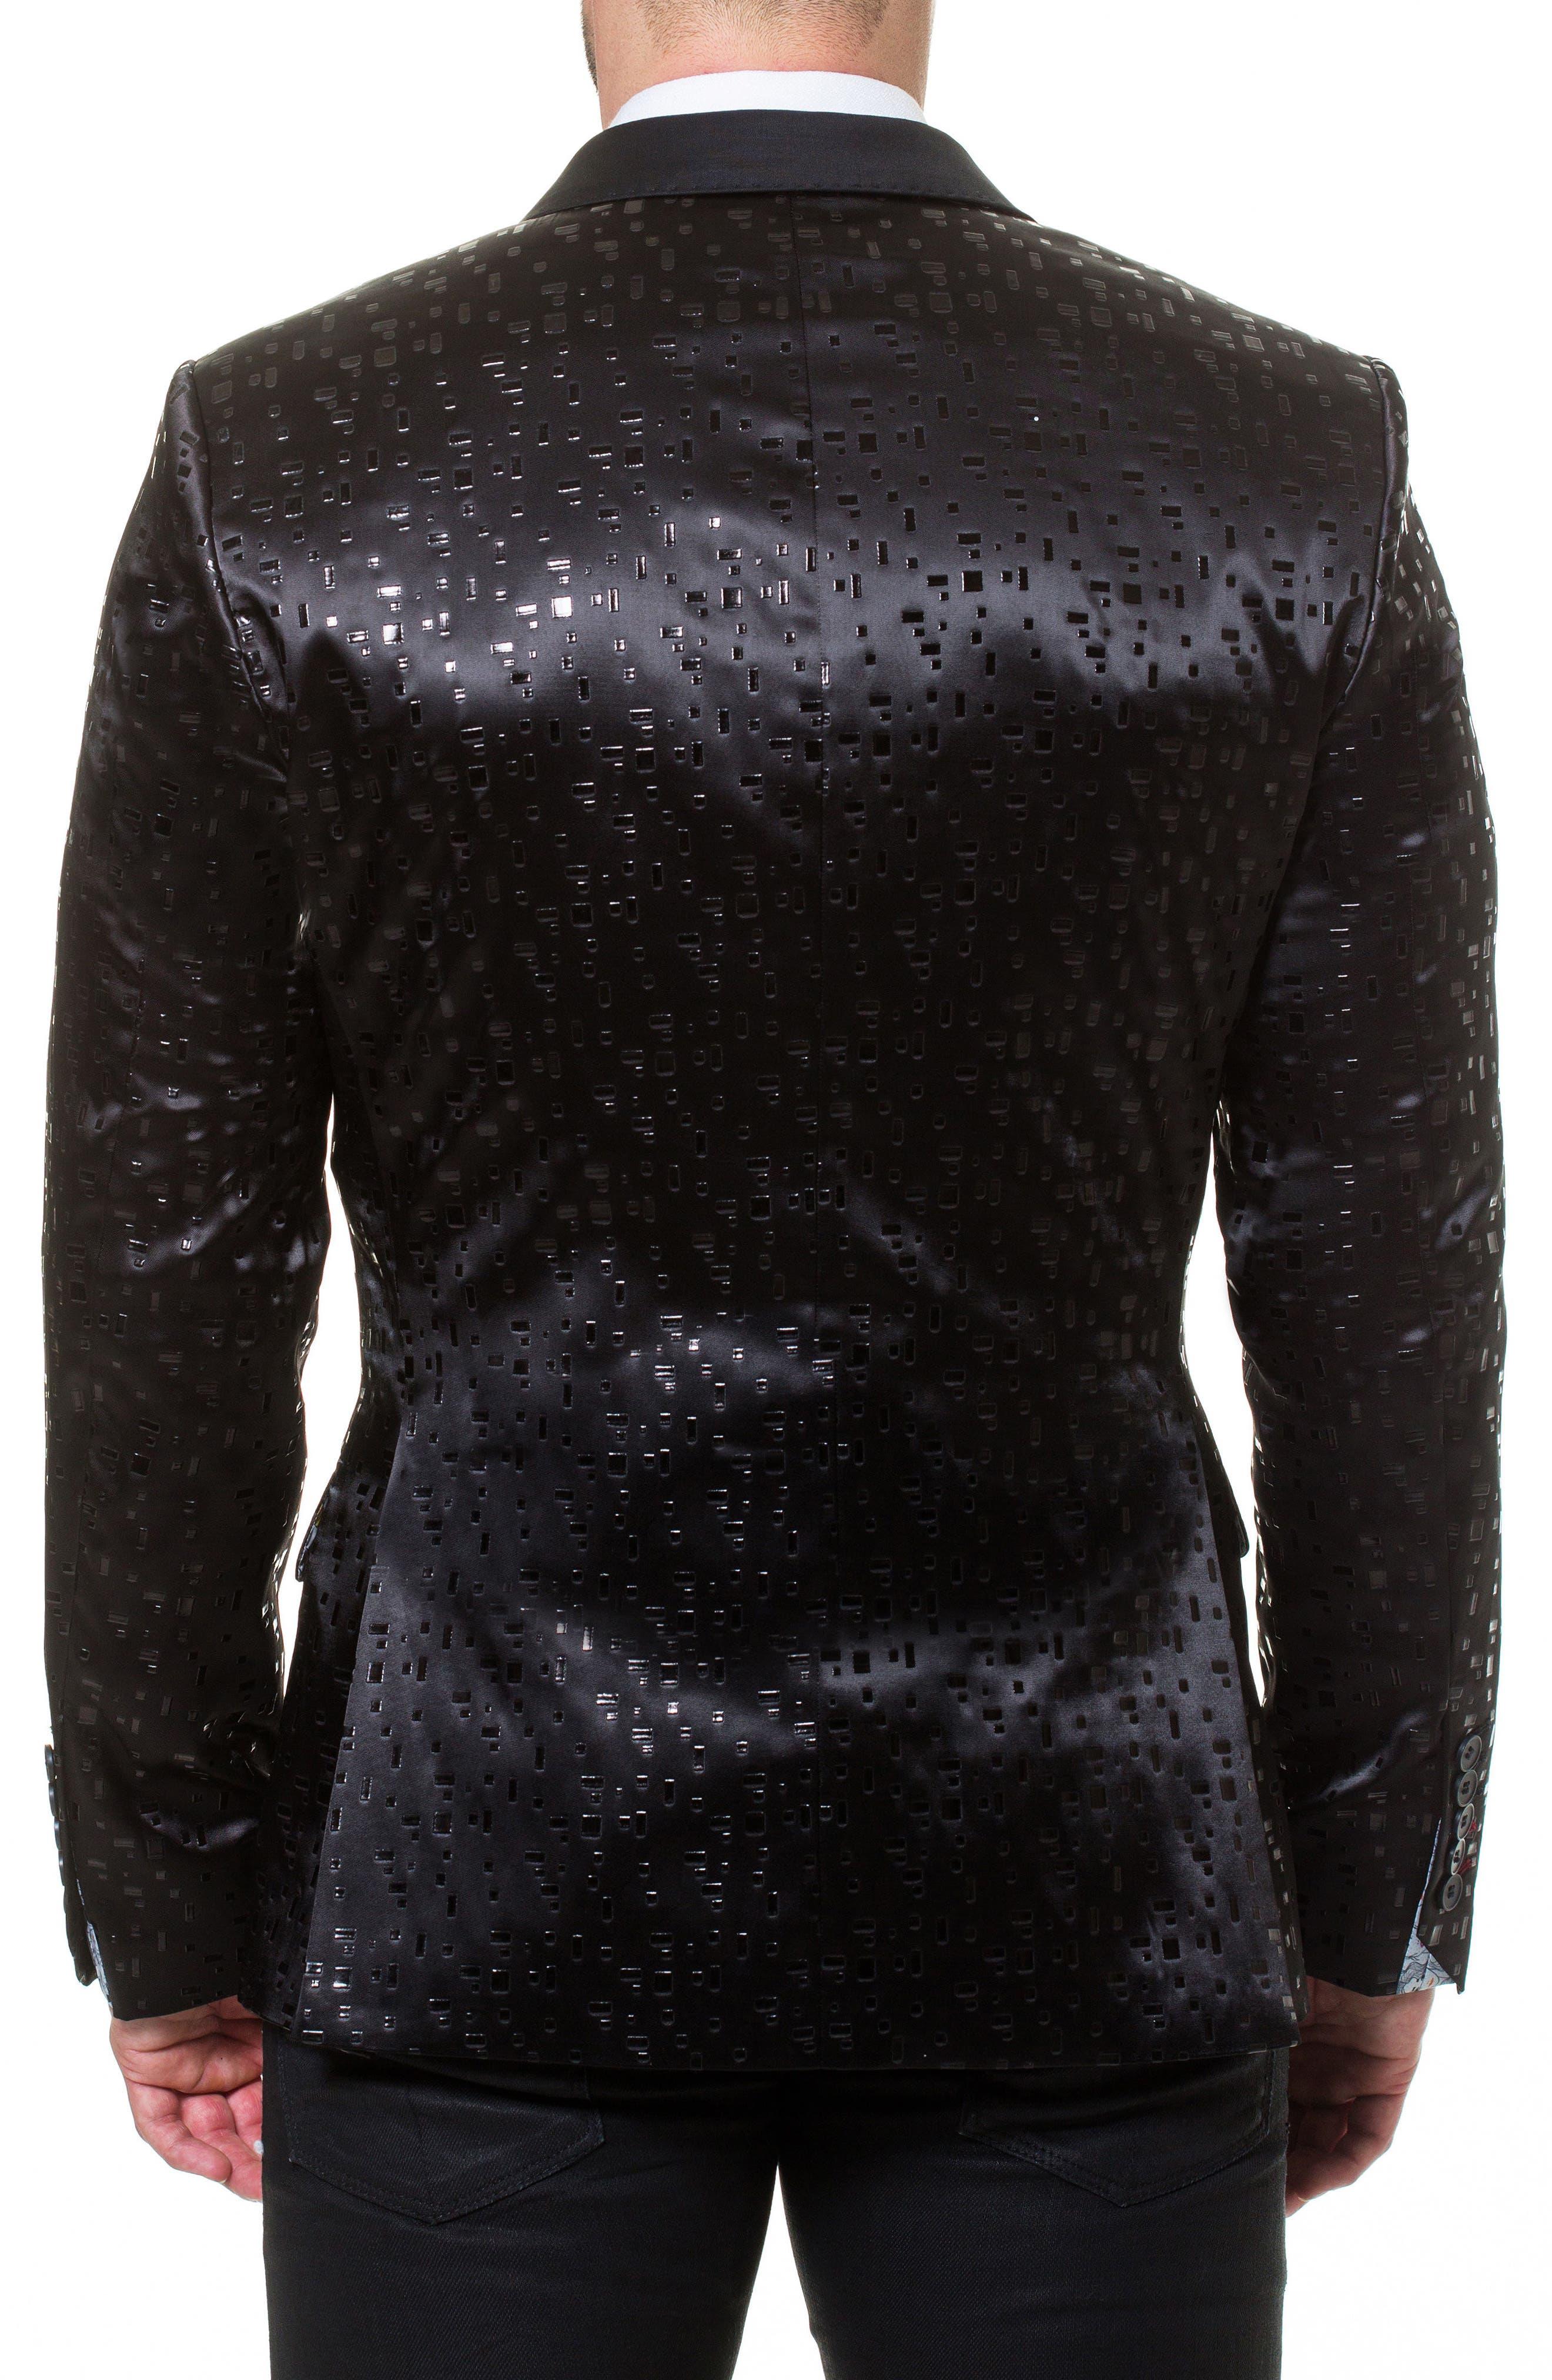 Socrate Blocks Sport Coat,                             Alternate thumbnail 2, color,                             Black